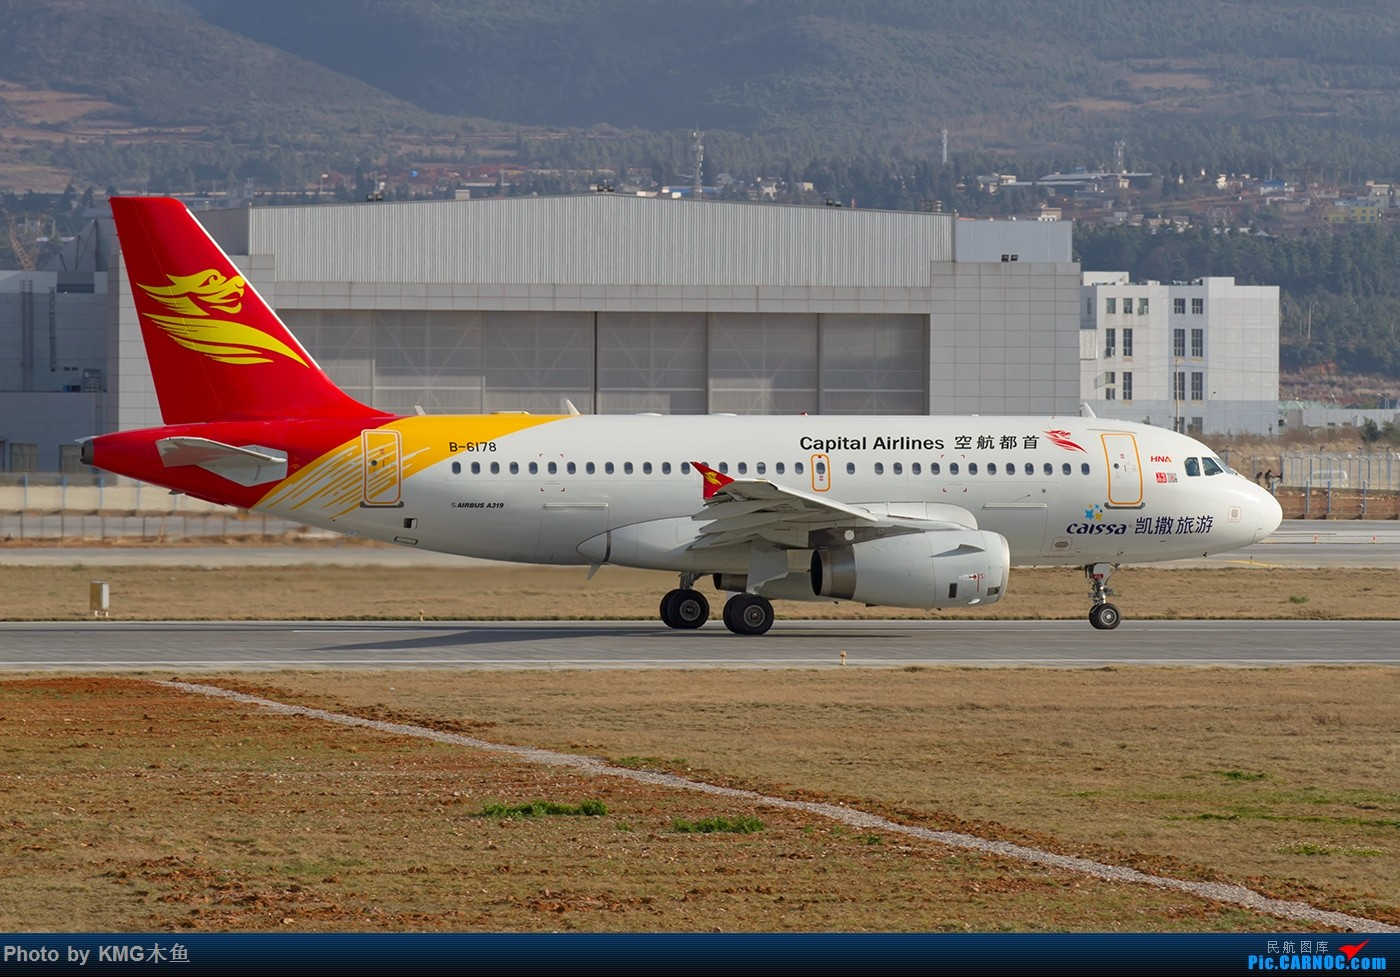 Re:[原创]【昆明飞友会-KMG木鱼】在长水国际机场,遇见英航云南,还是落地的 AIRBUS A319-100 B-6178 中国昆明长水国际机场